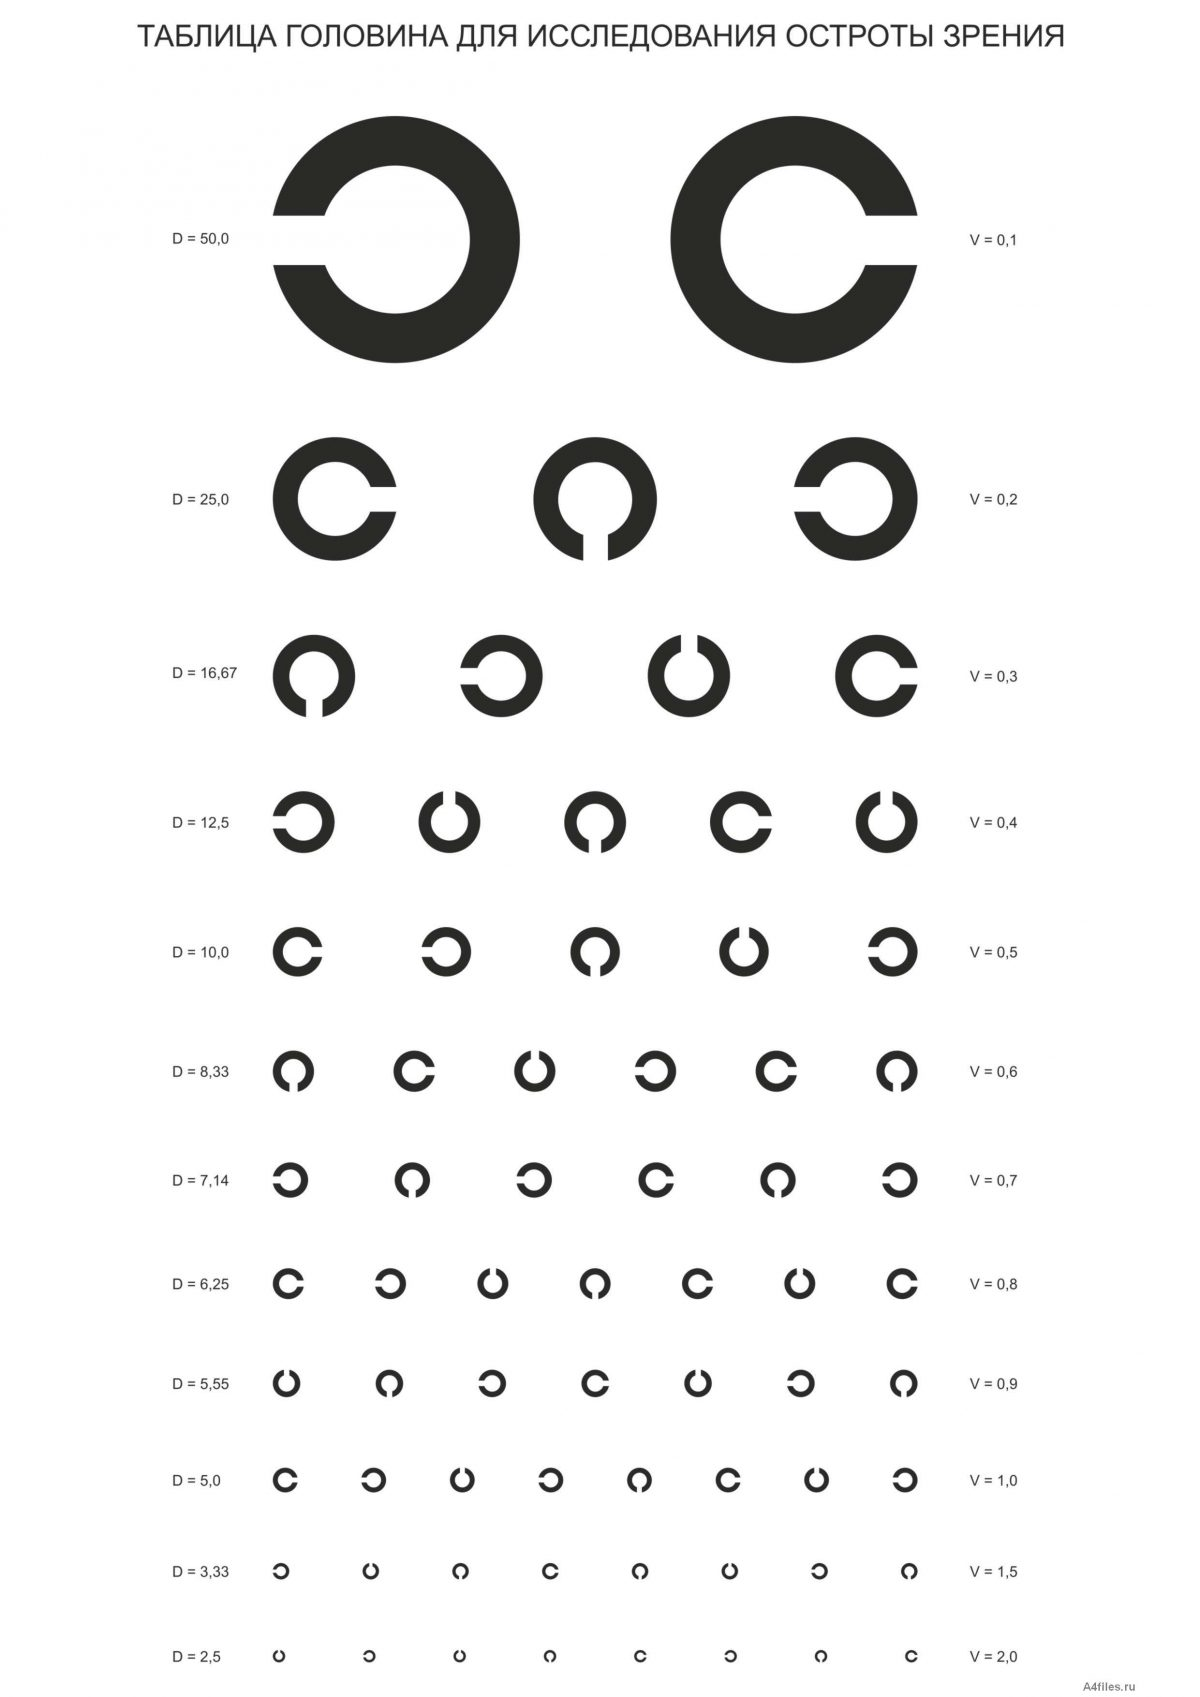 Таблица Головина для исследования зрения